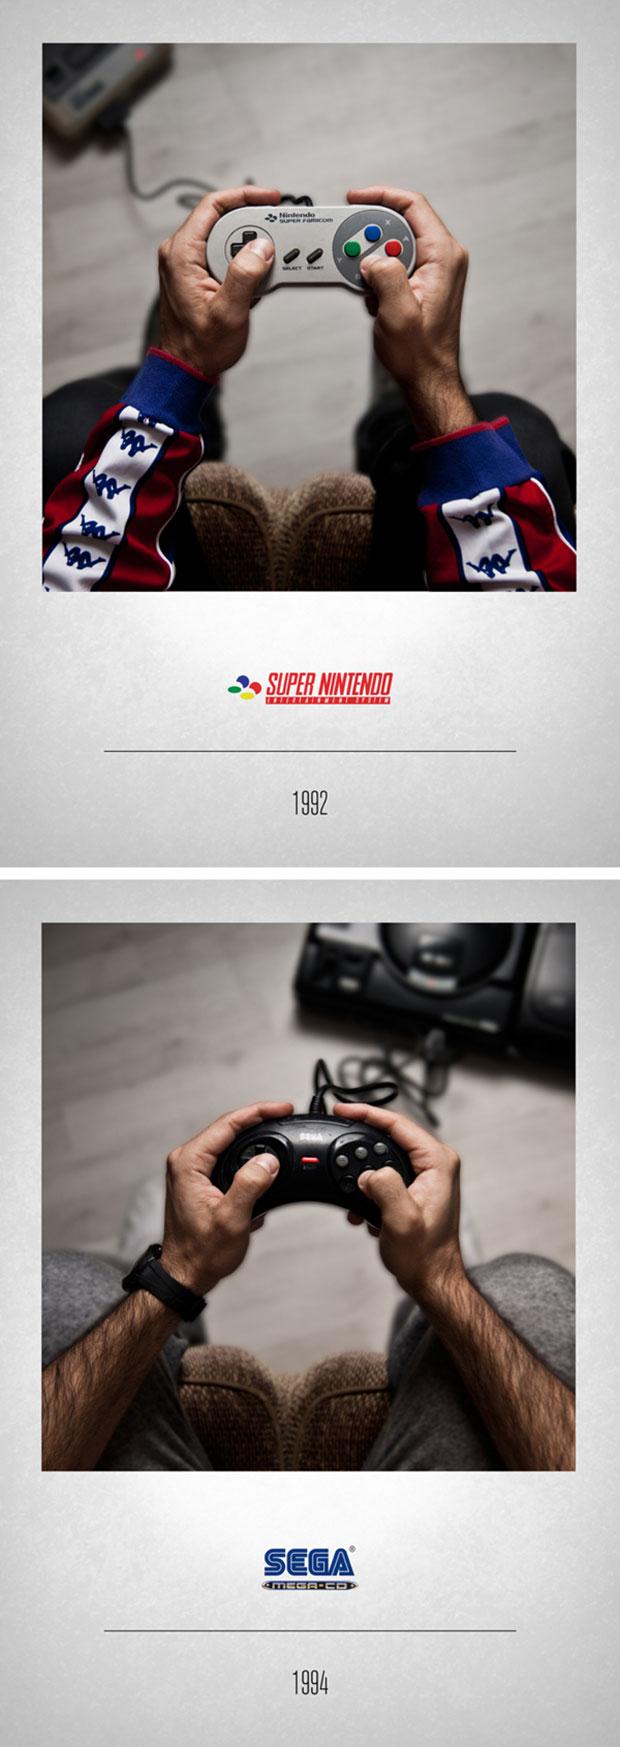 esq-video-controller-history-9-KgCzOq-10